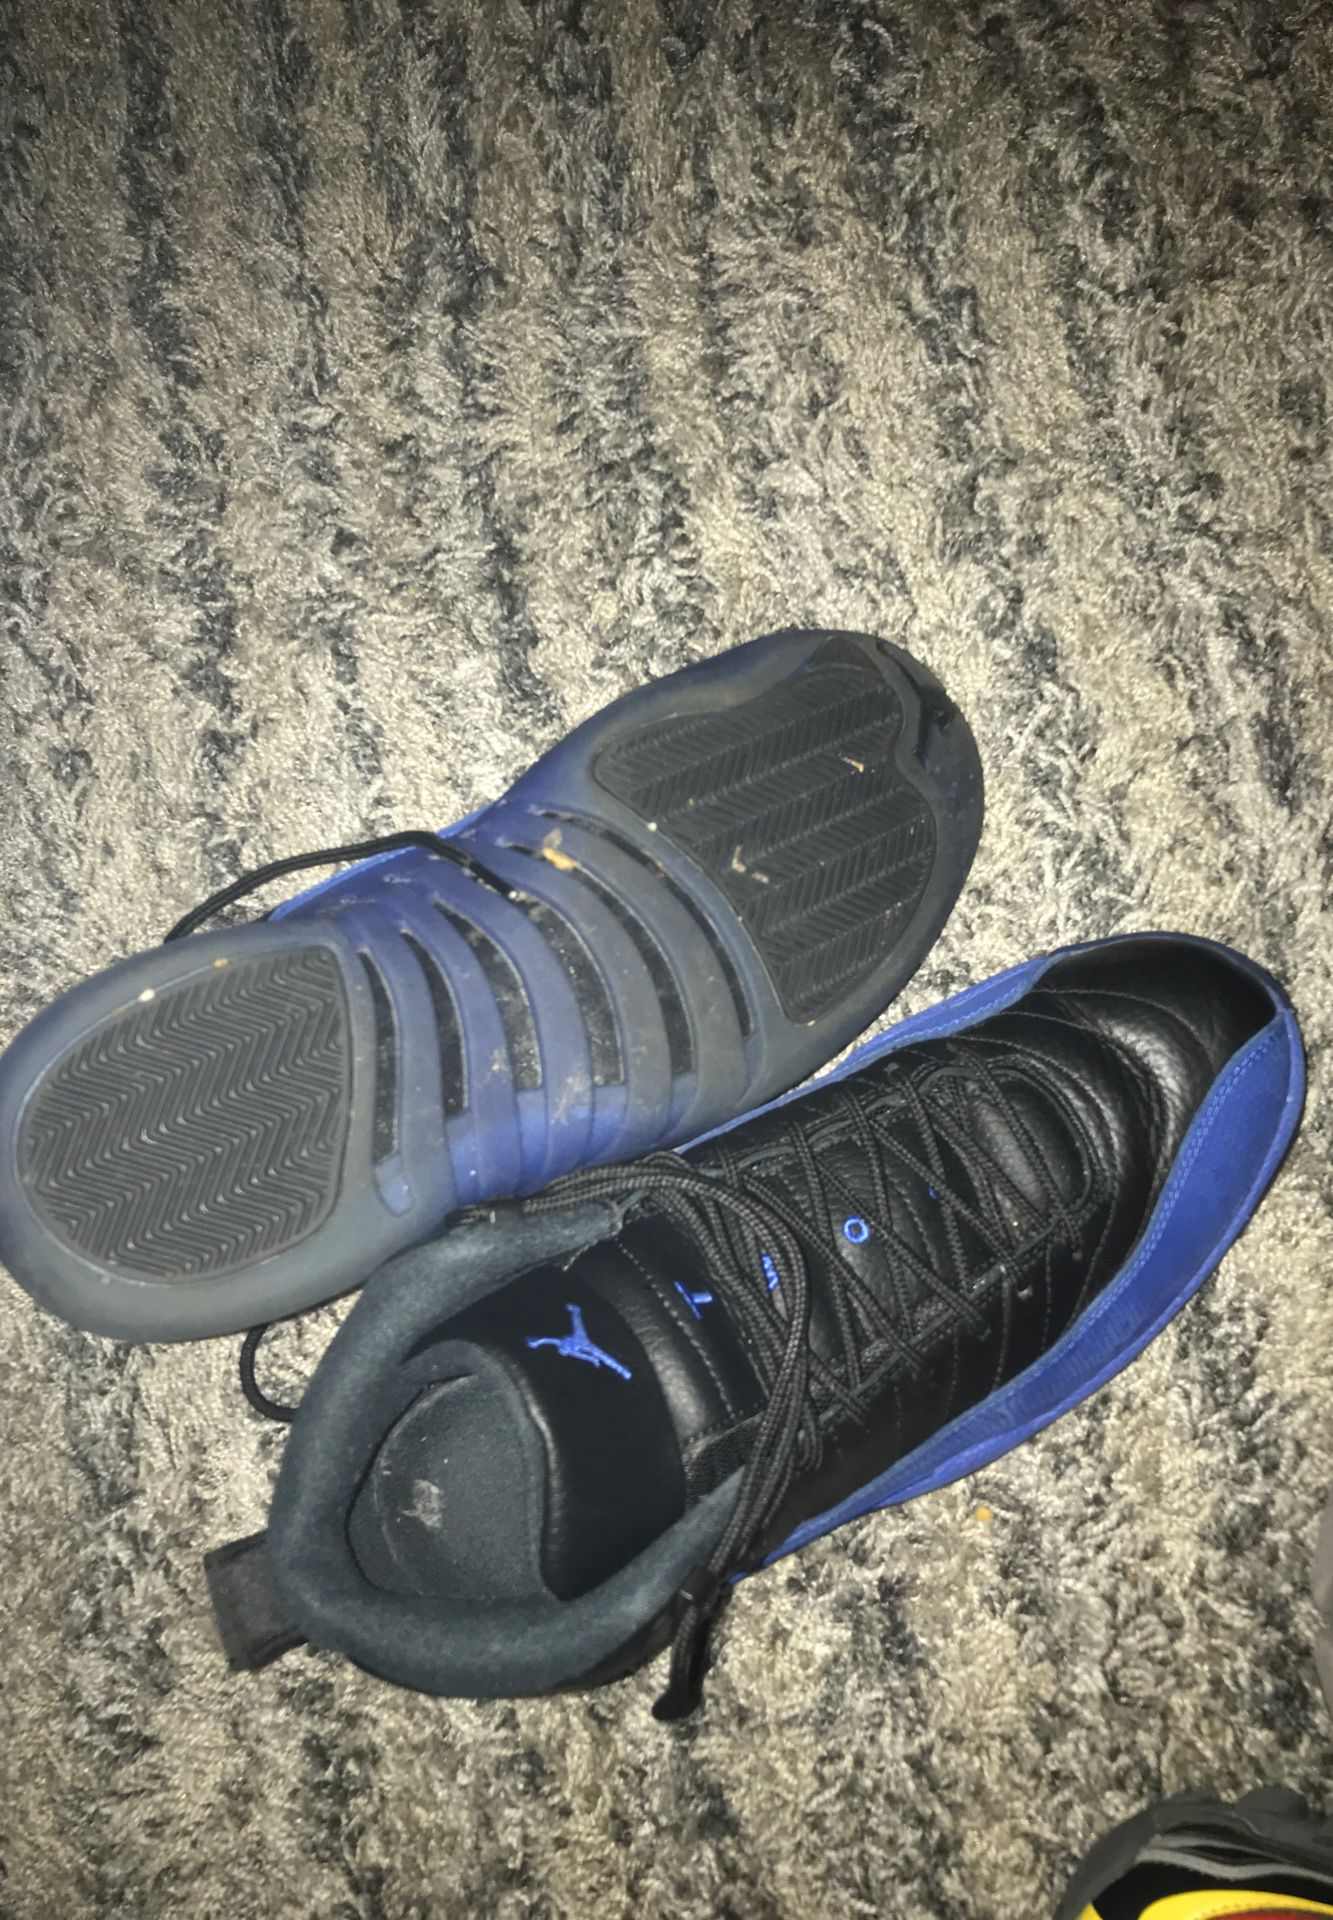 Blue & Black Jordan 23